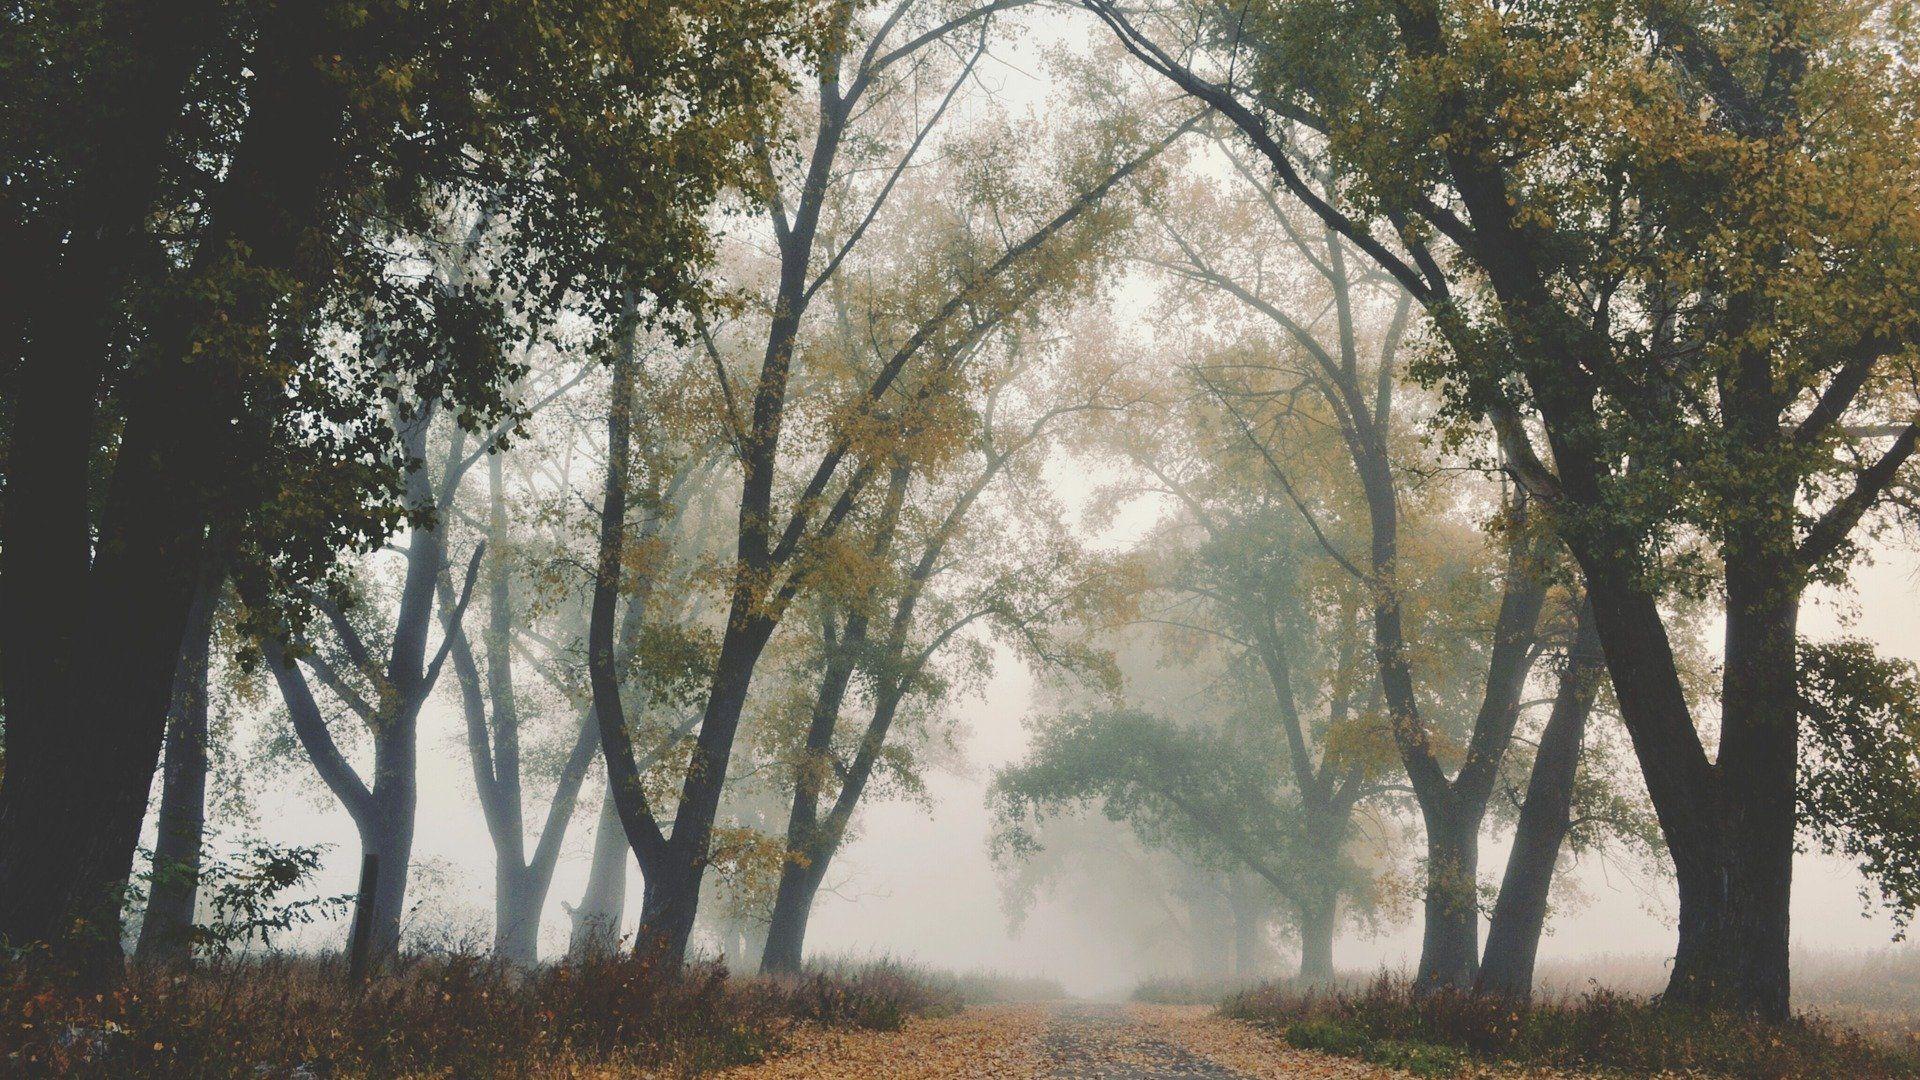 Туман осенью - Sputnik Беларусь, 1920, 22.09.2021